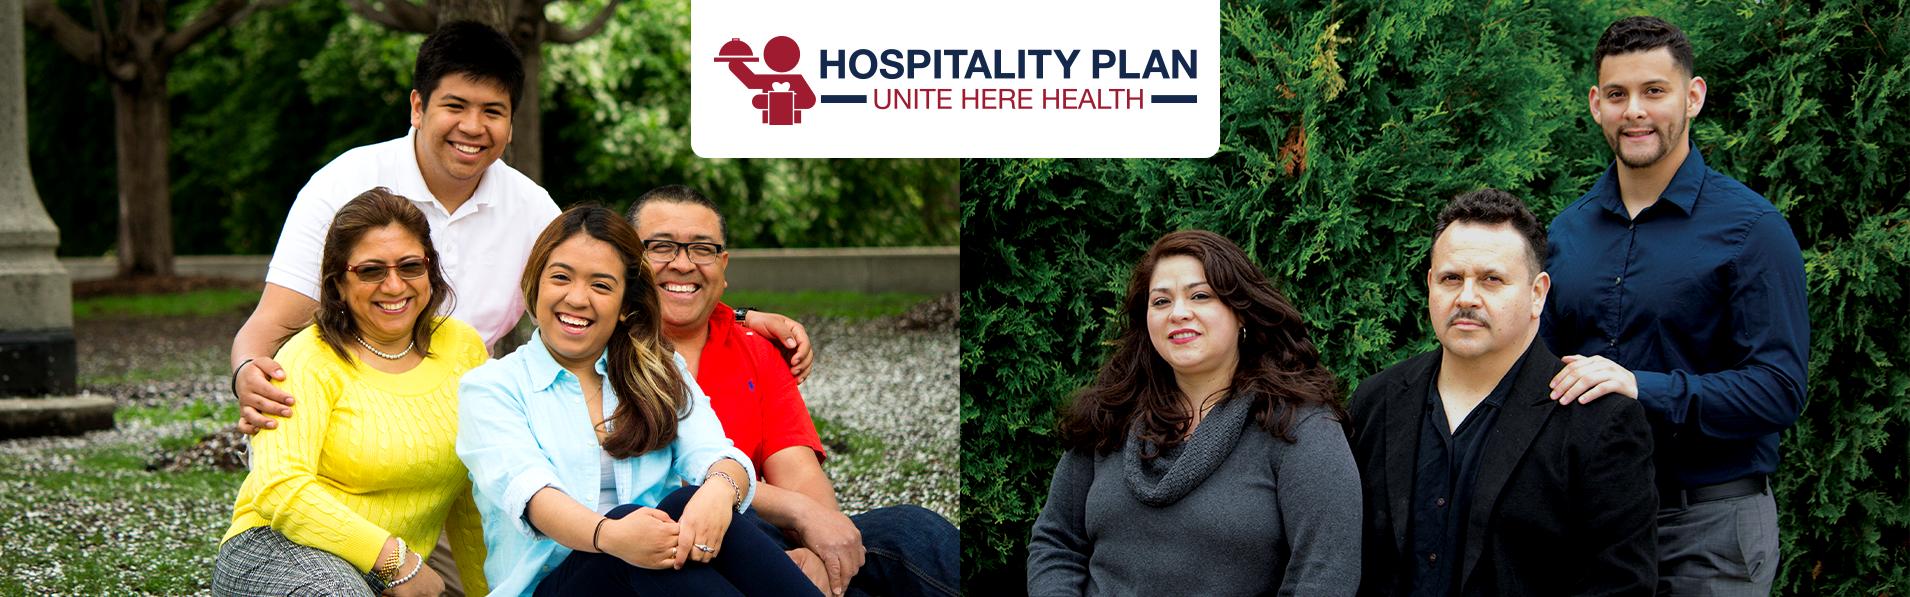 Hospitality Plan